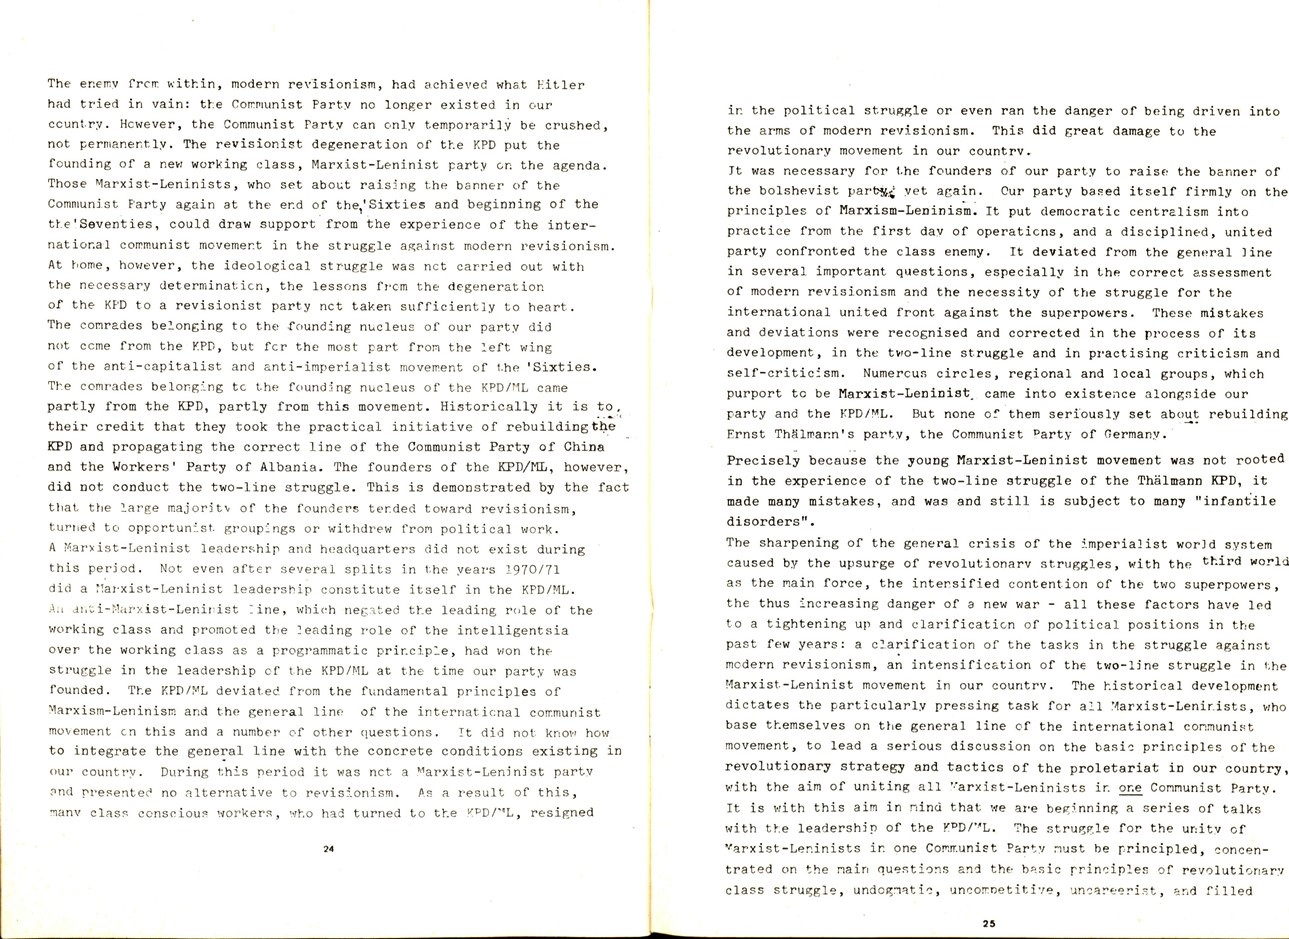 KPDAO_1976_Declaration_14